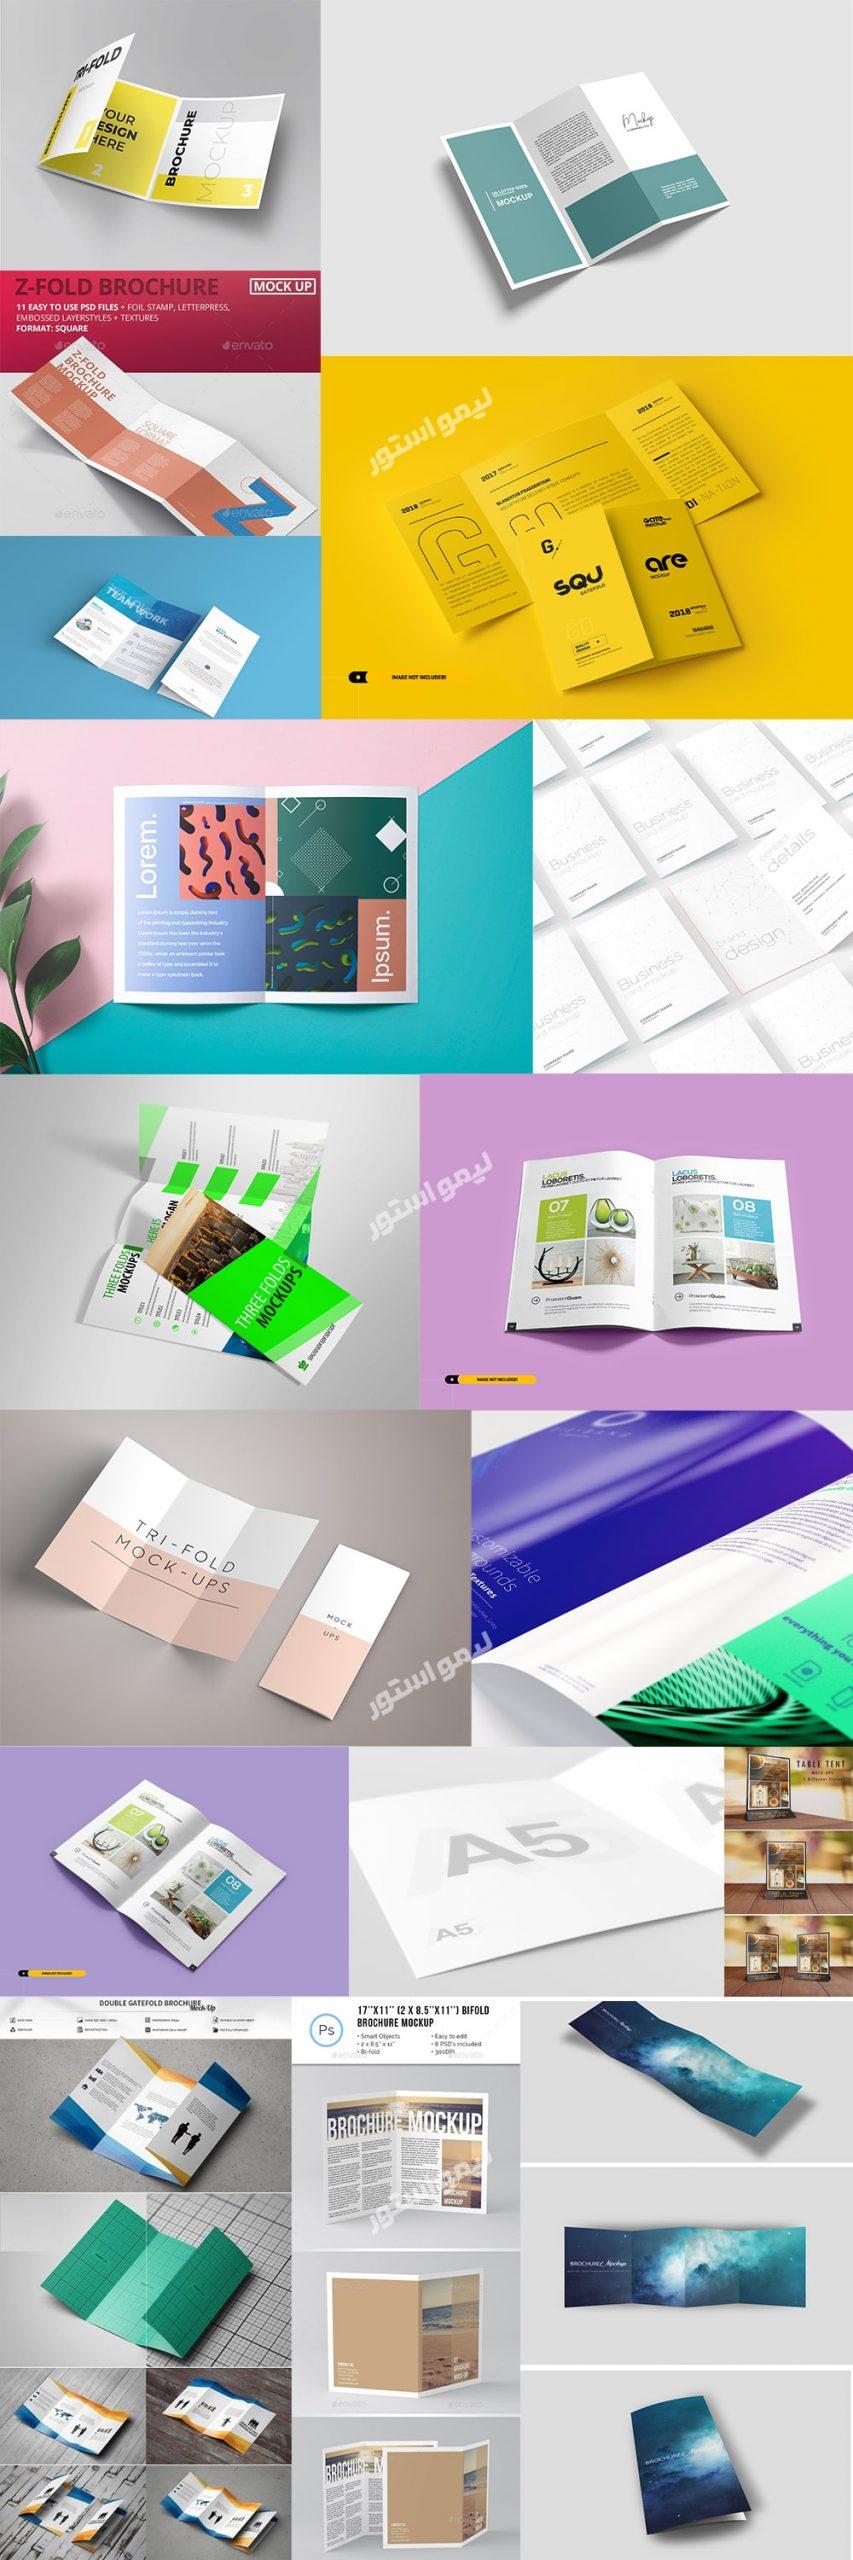 مجموعه موکاپ بروشور Brochure